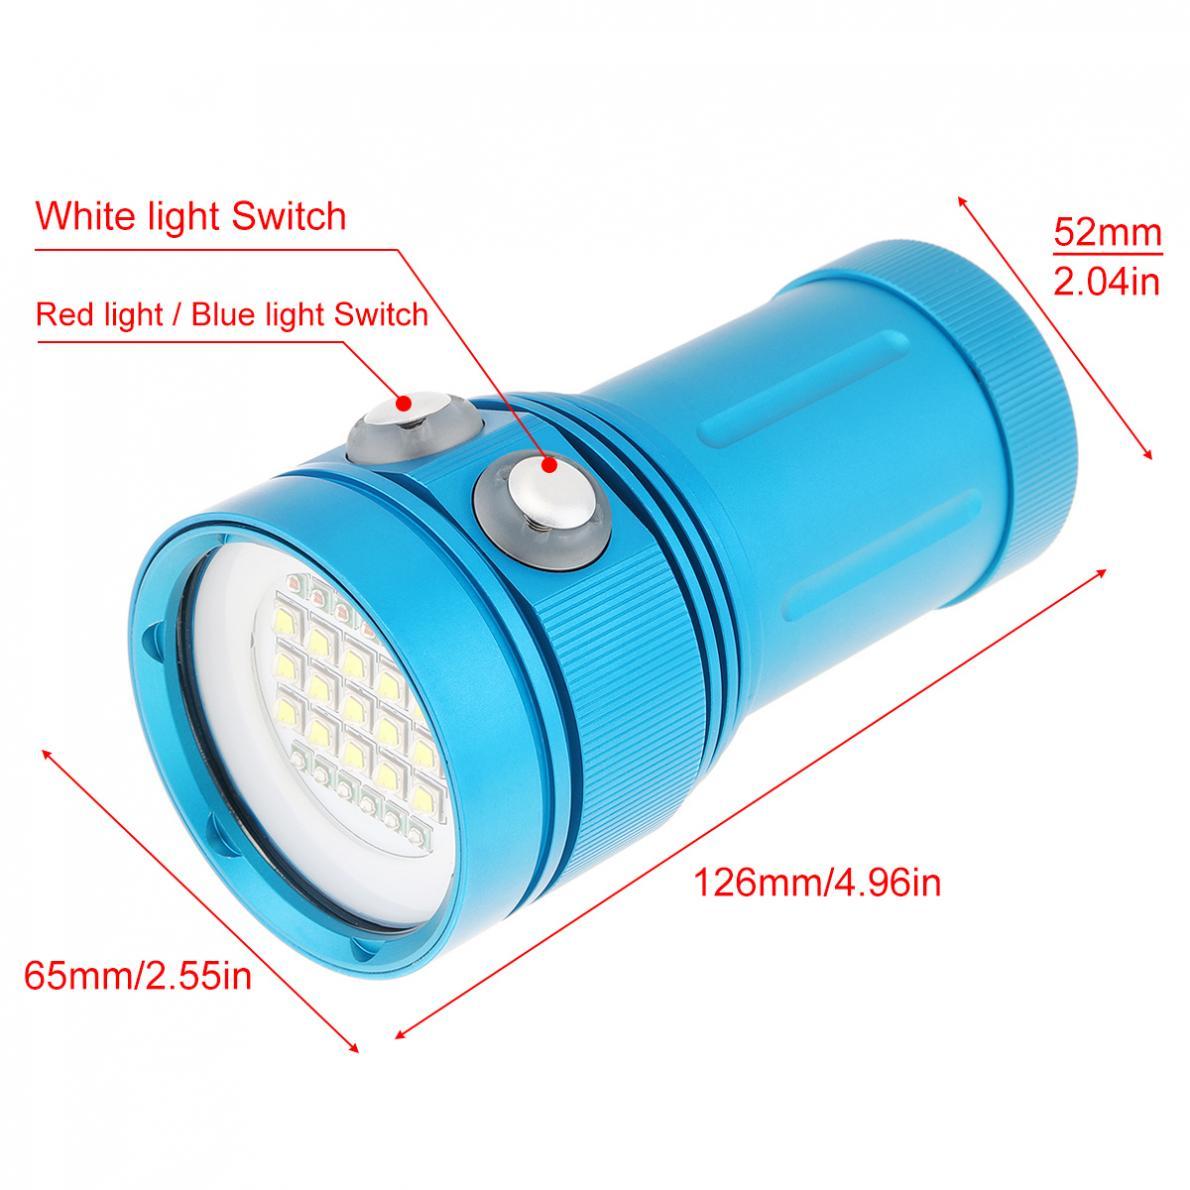 Universal Professional Diving Light Underwater 100m Scuba Video Light 150W 15 XML2 LED Photography Video Dive Flashlight enlarge